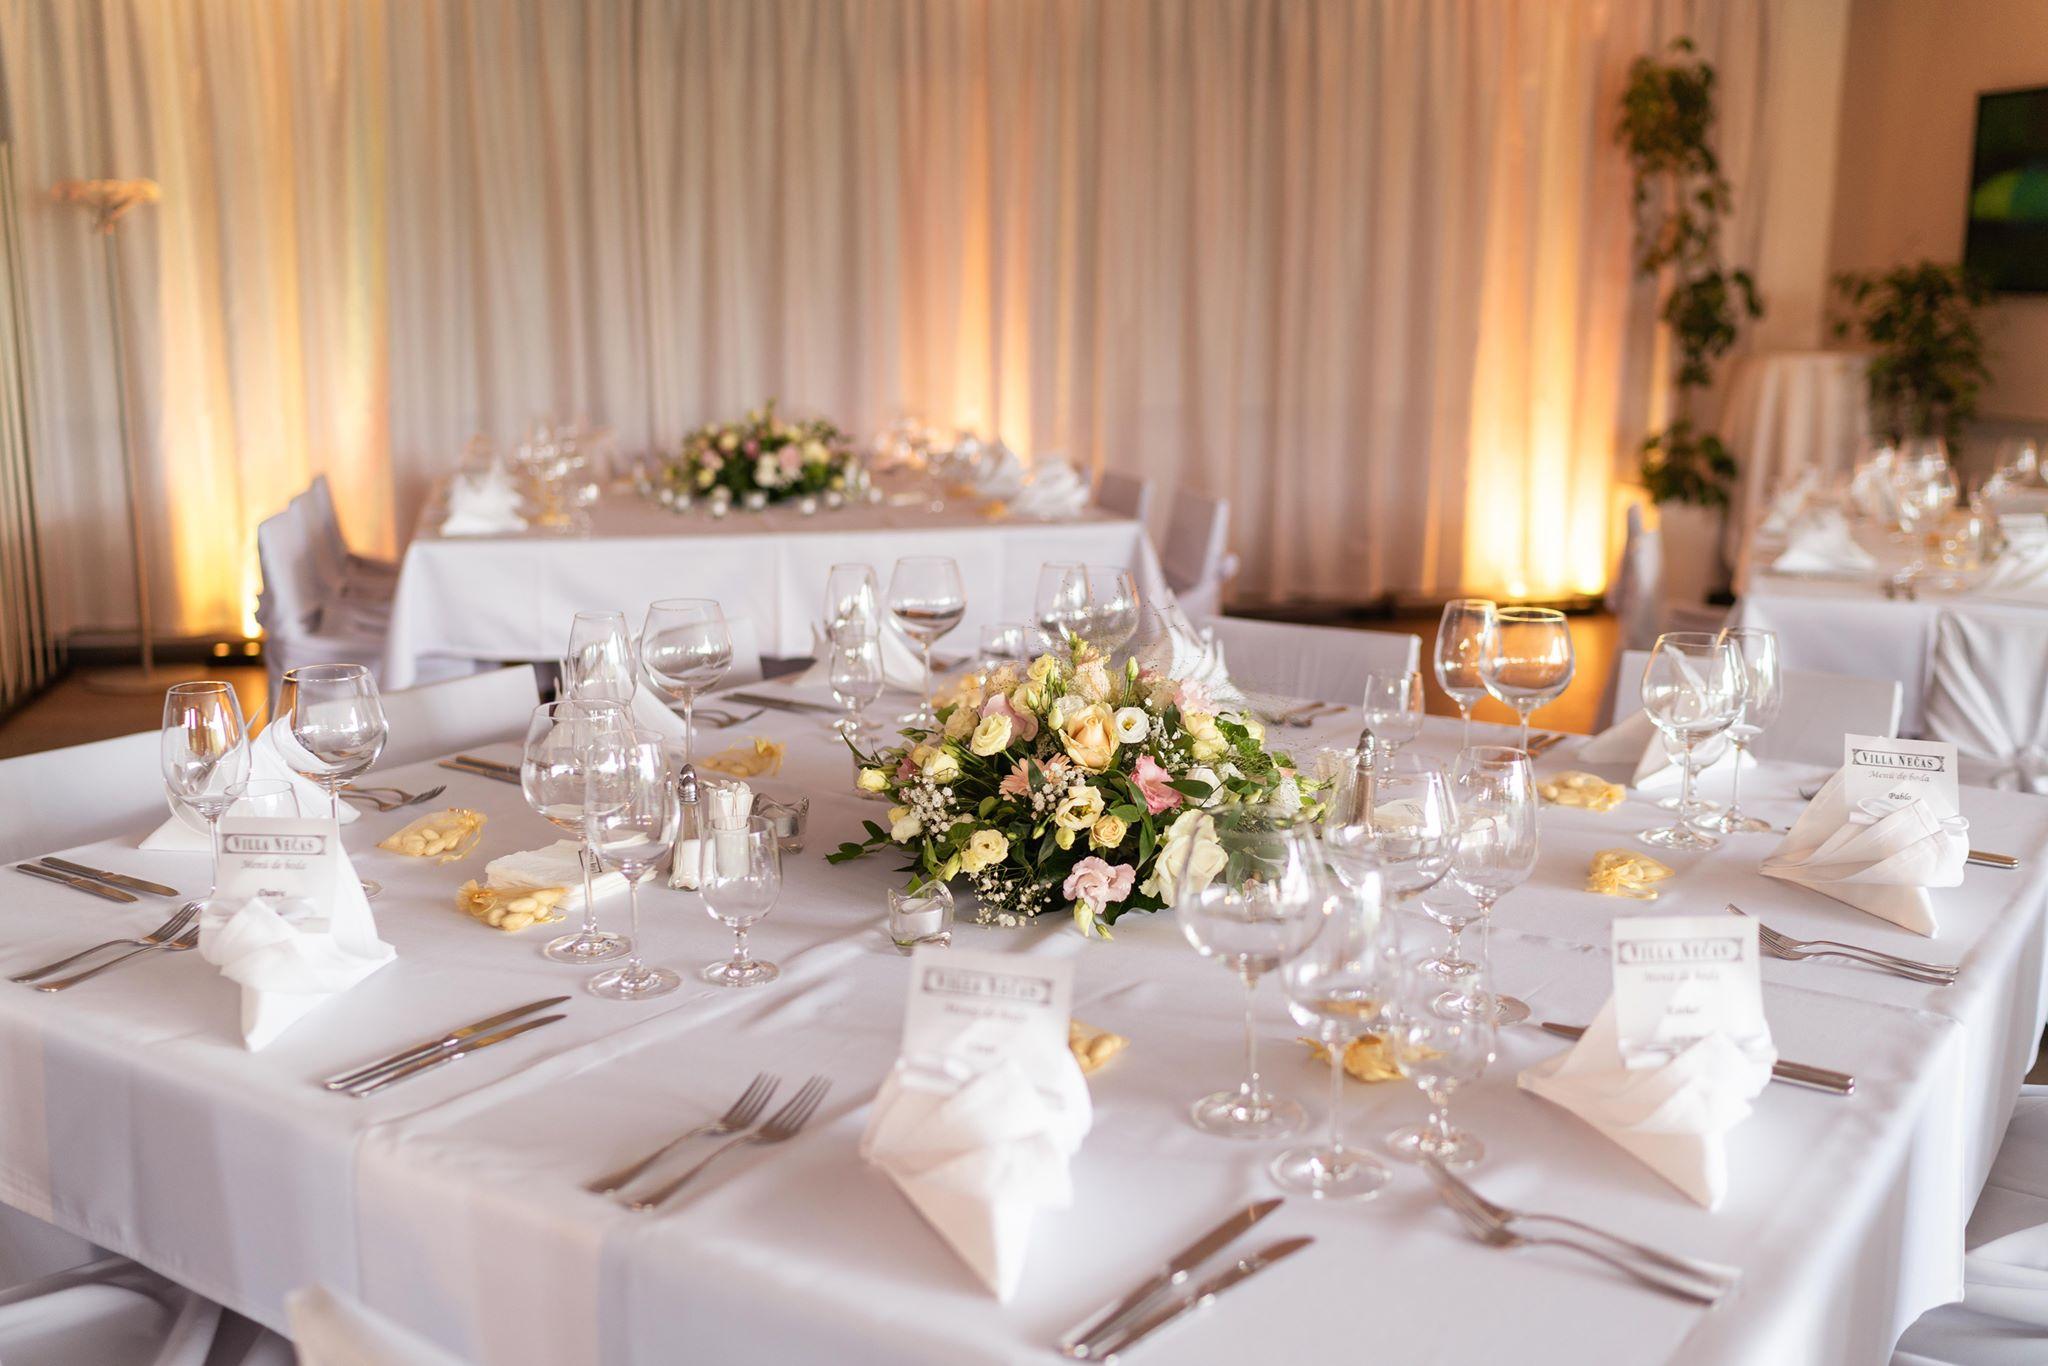 osvetlenie-saly-nasvietenie-saly-villa-necas-svadbajpg